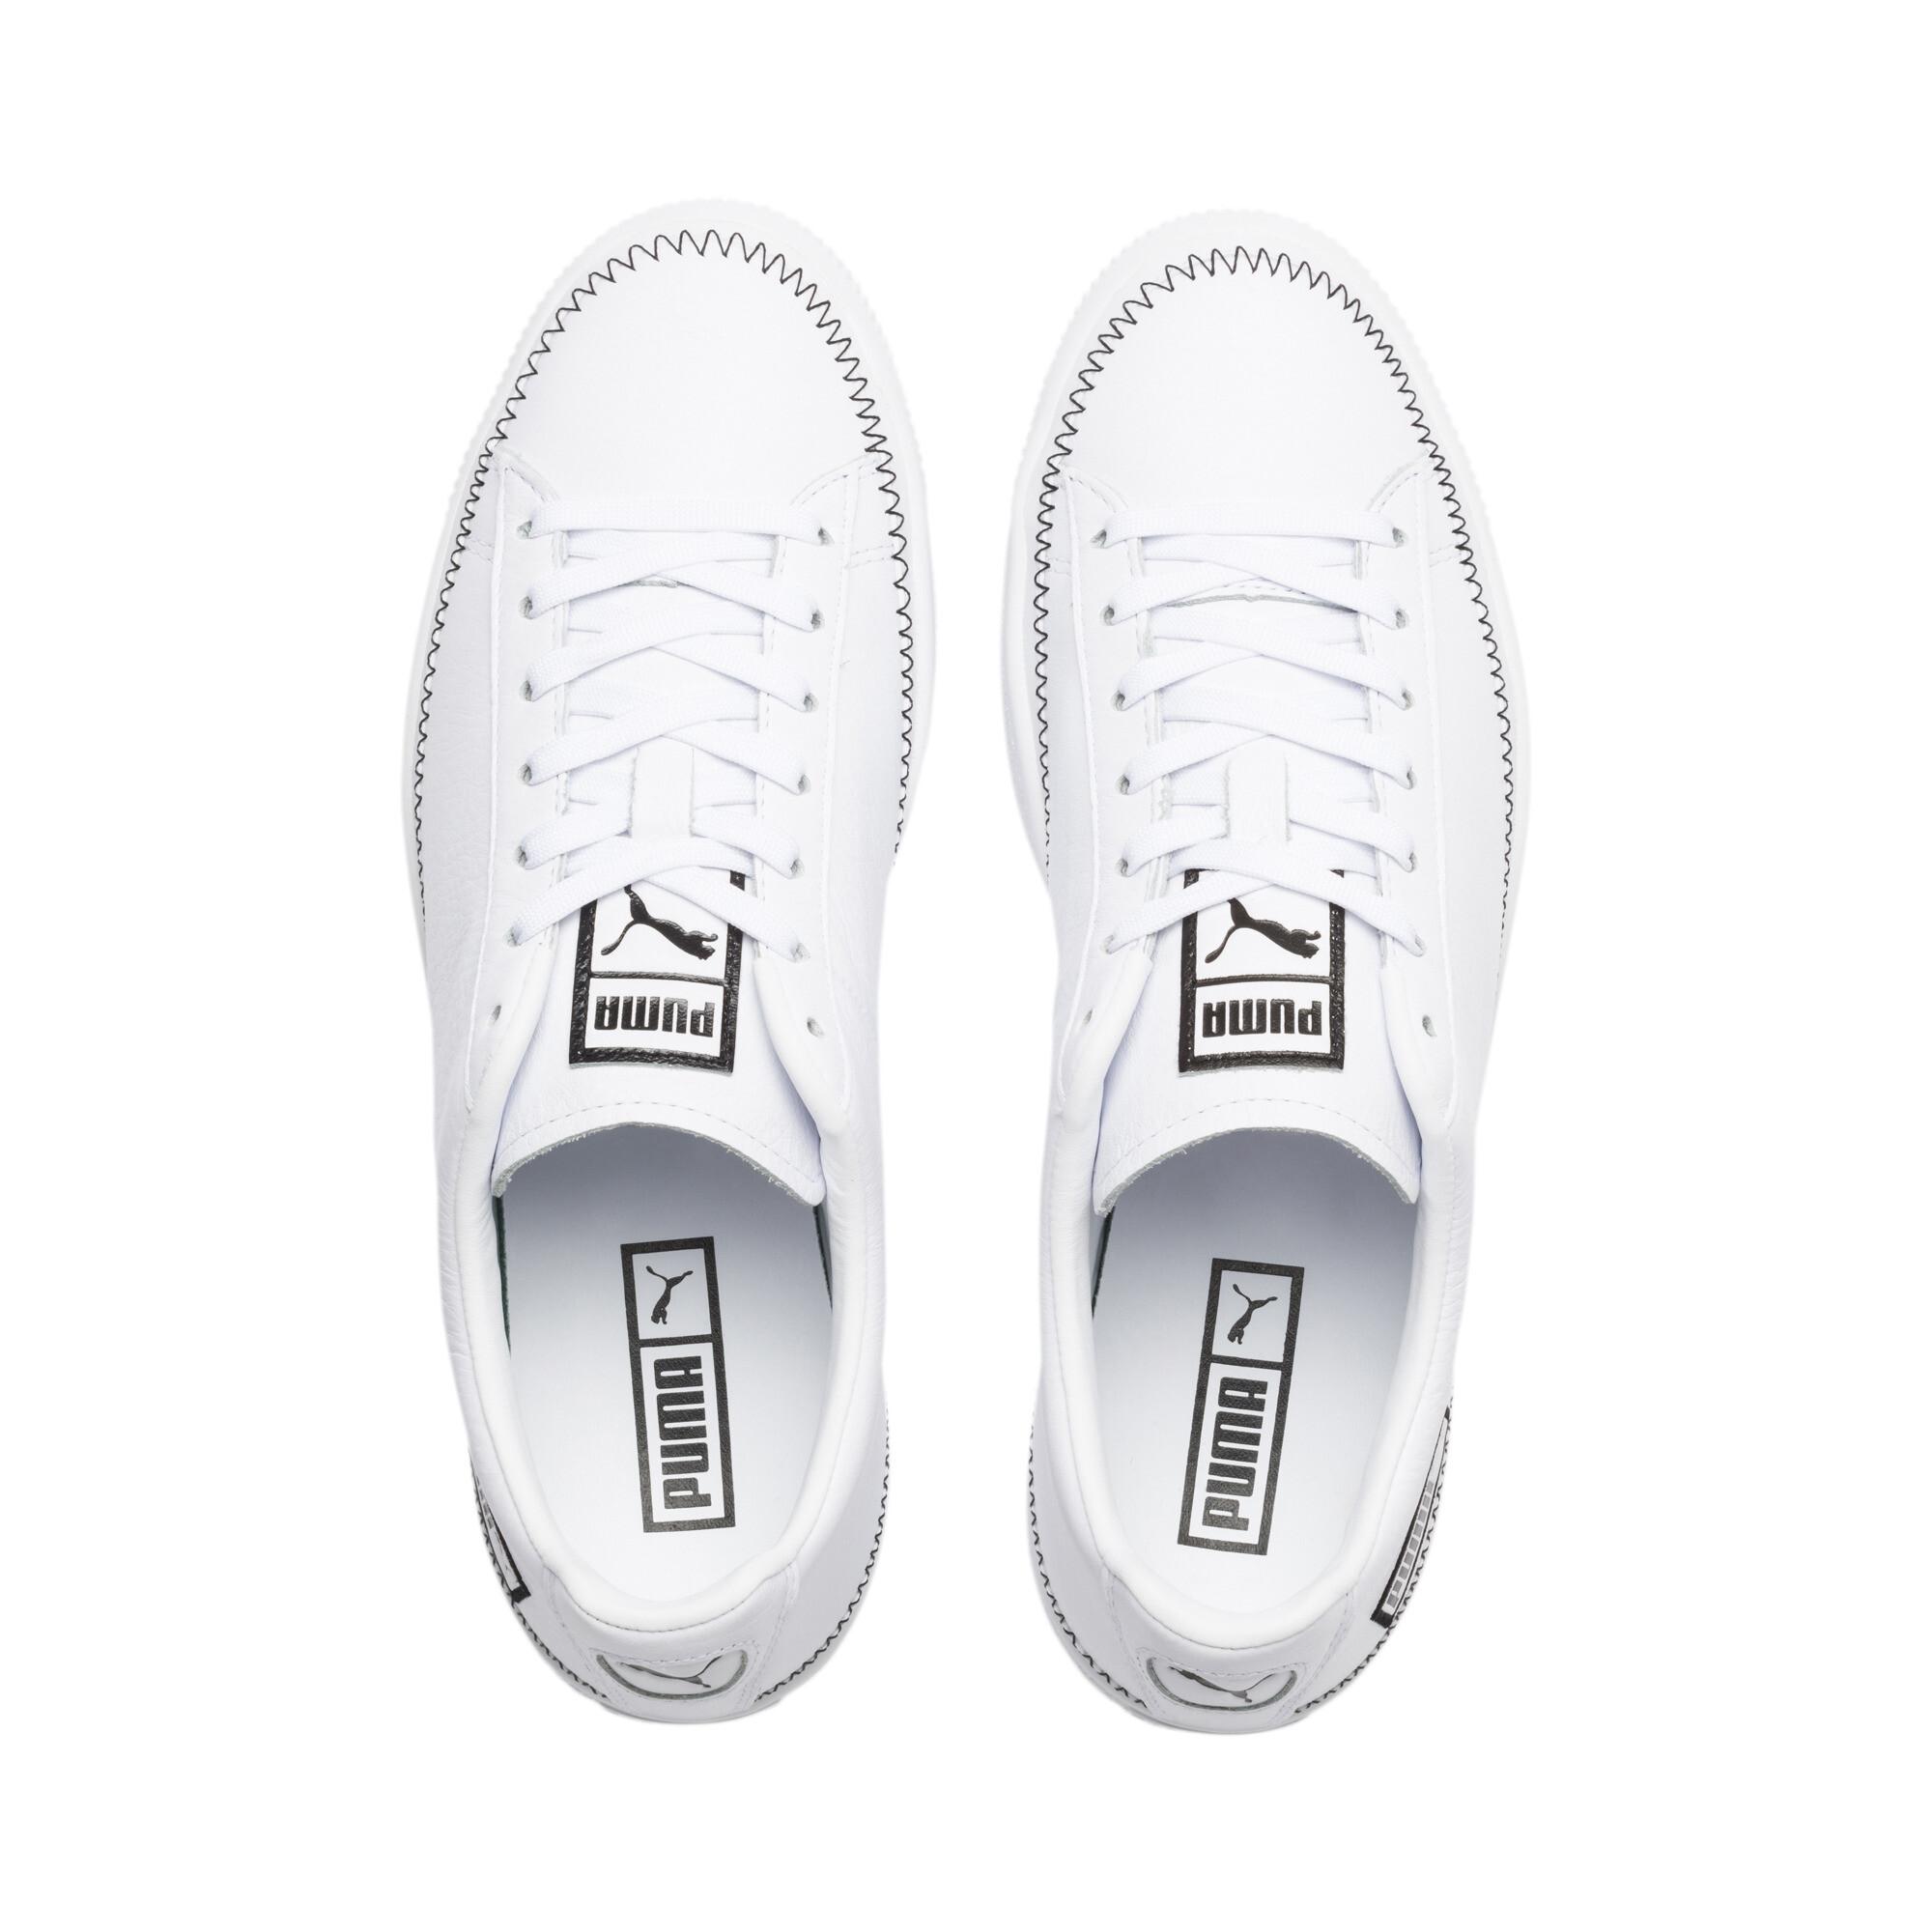 PUMA-Basket-Stitch-Sneaker-Unisex-Schuhe-Neu Indexbild 19